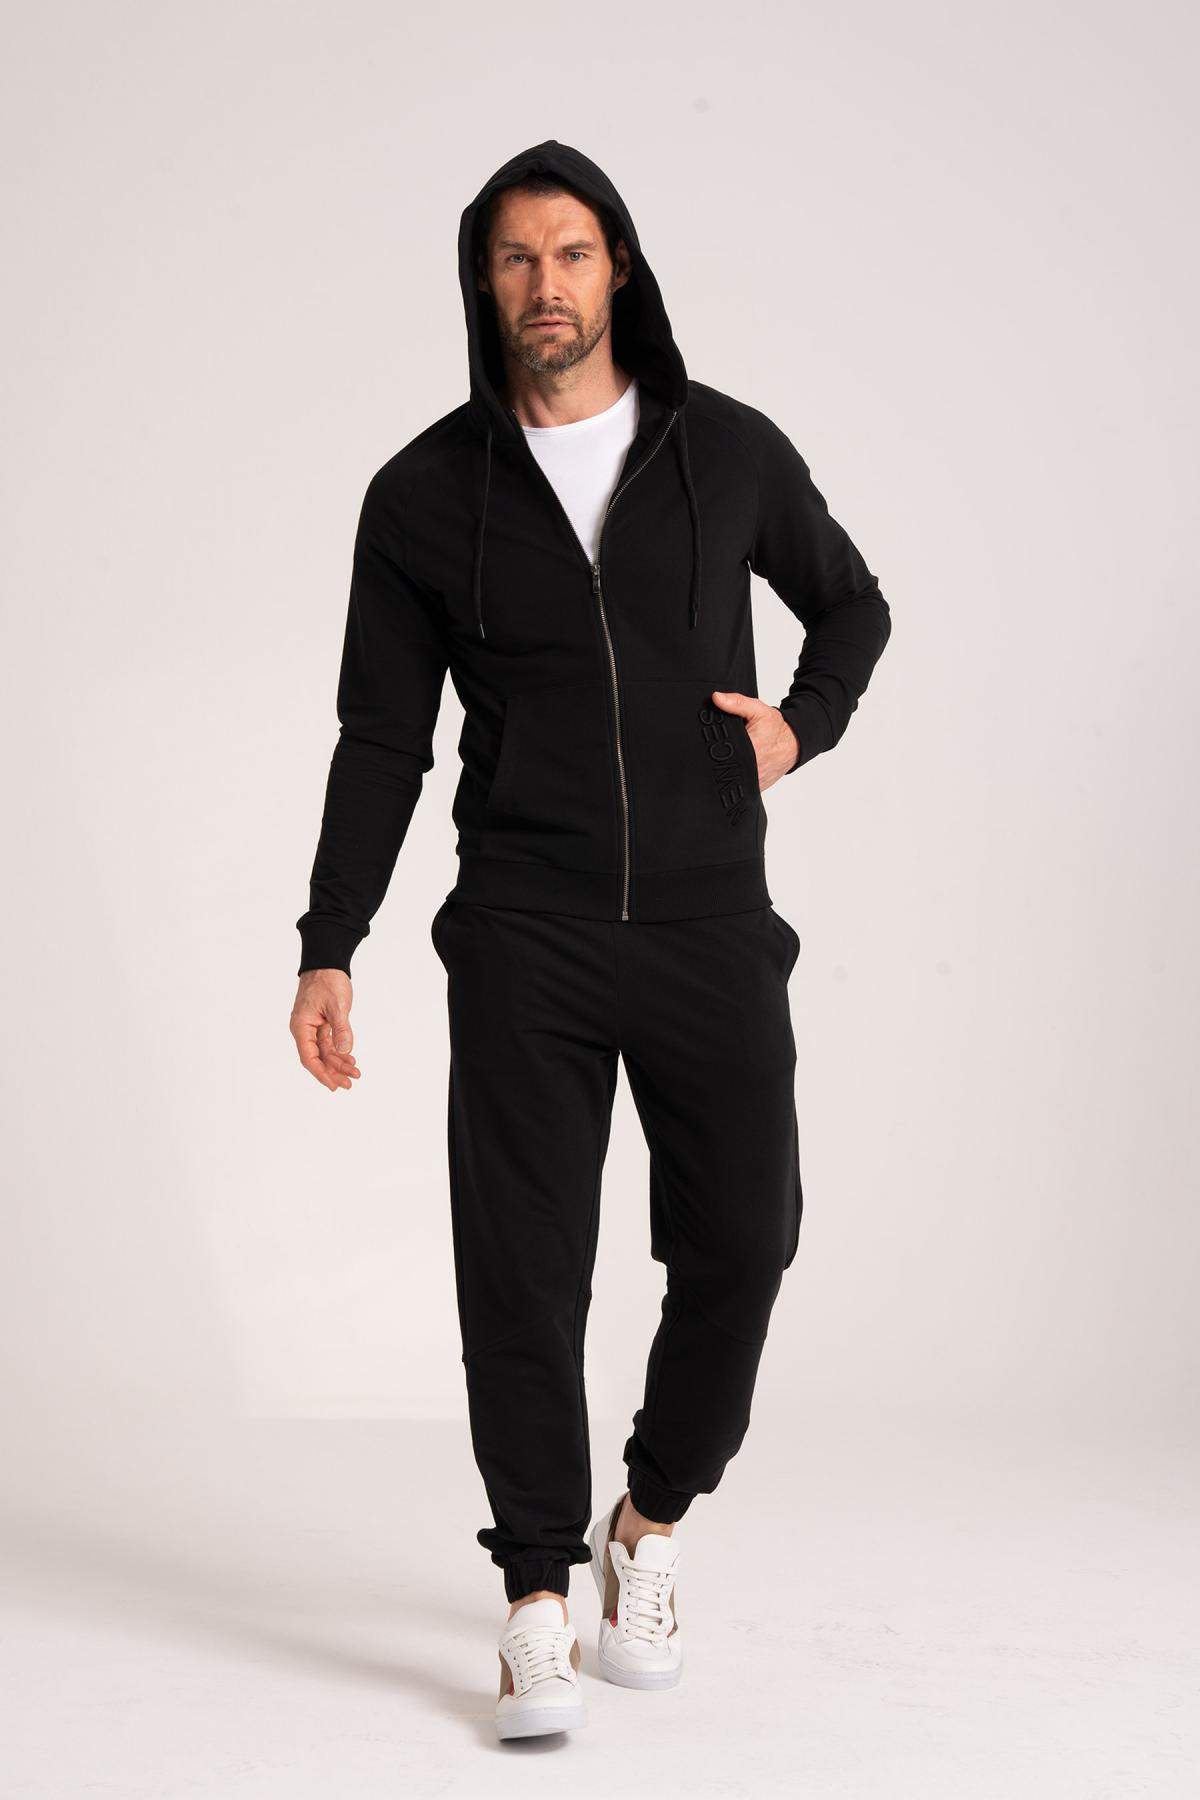 Zippered Sweatshirt newces-5009-B